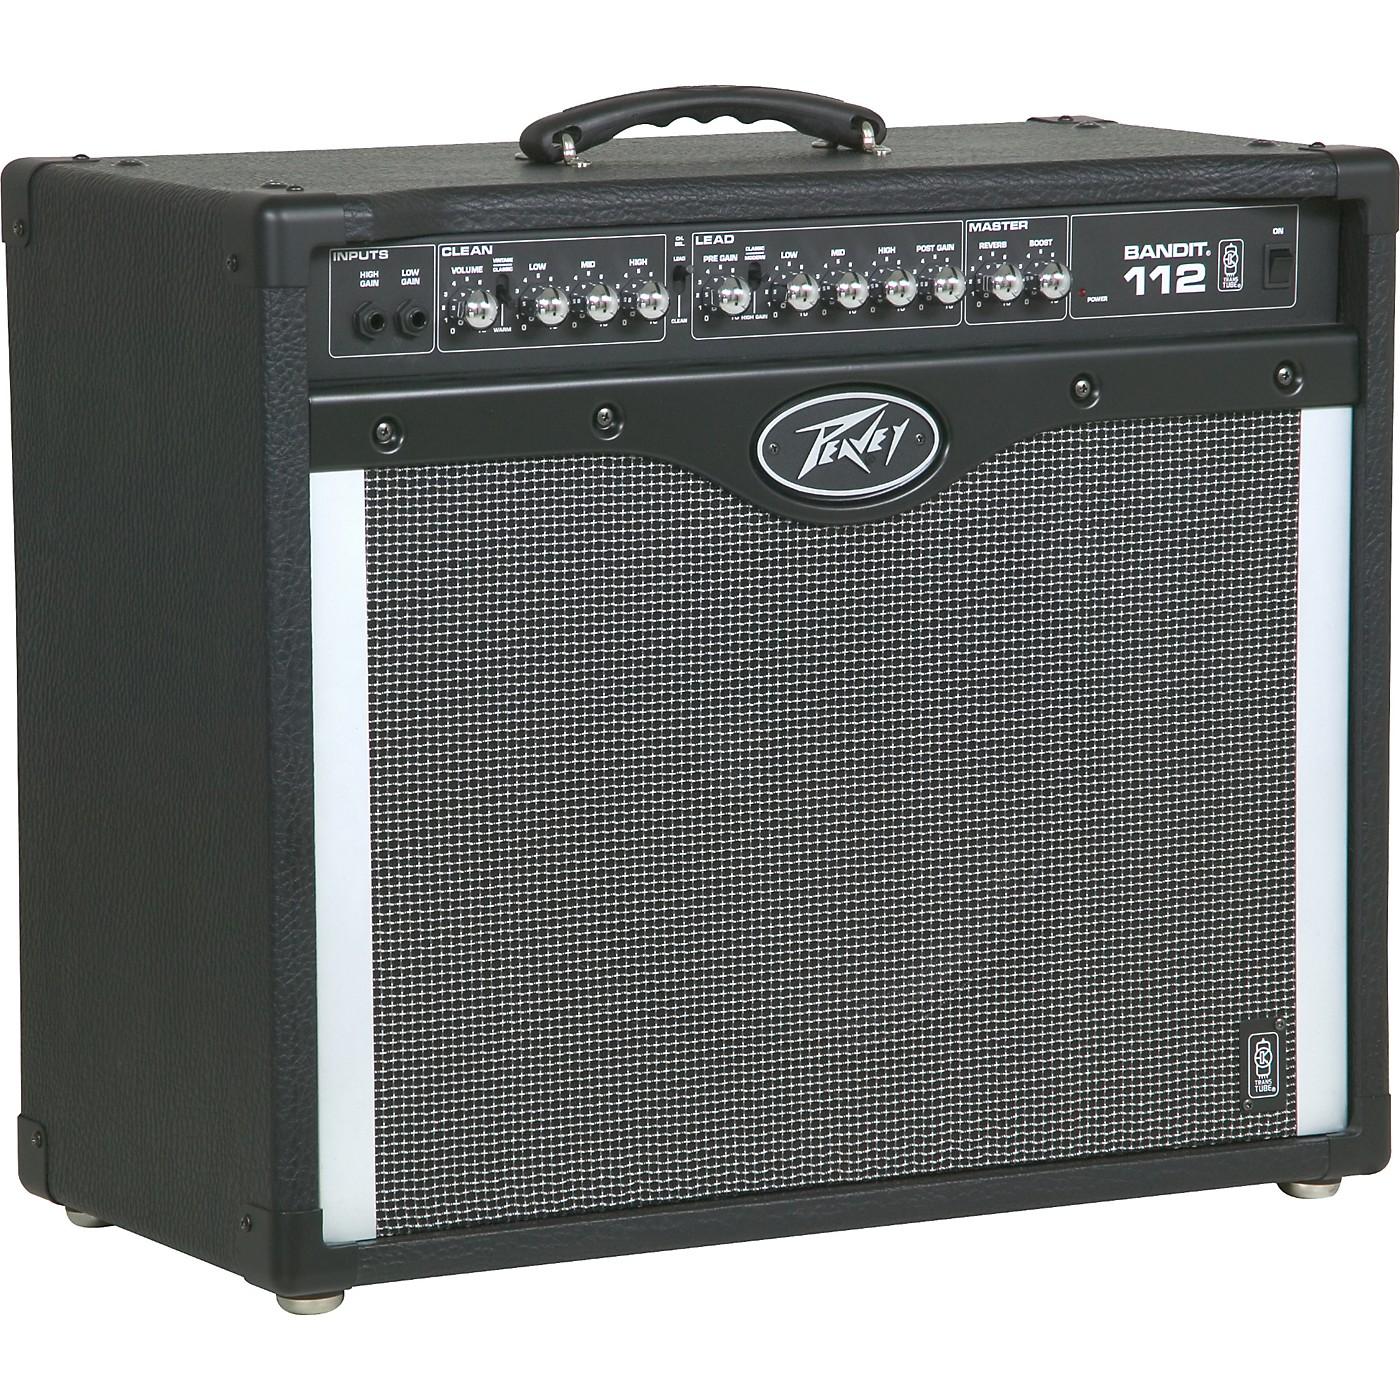 Peavey Bandit 112 Guitar Amplifier with TransTube Technology thumbnail